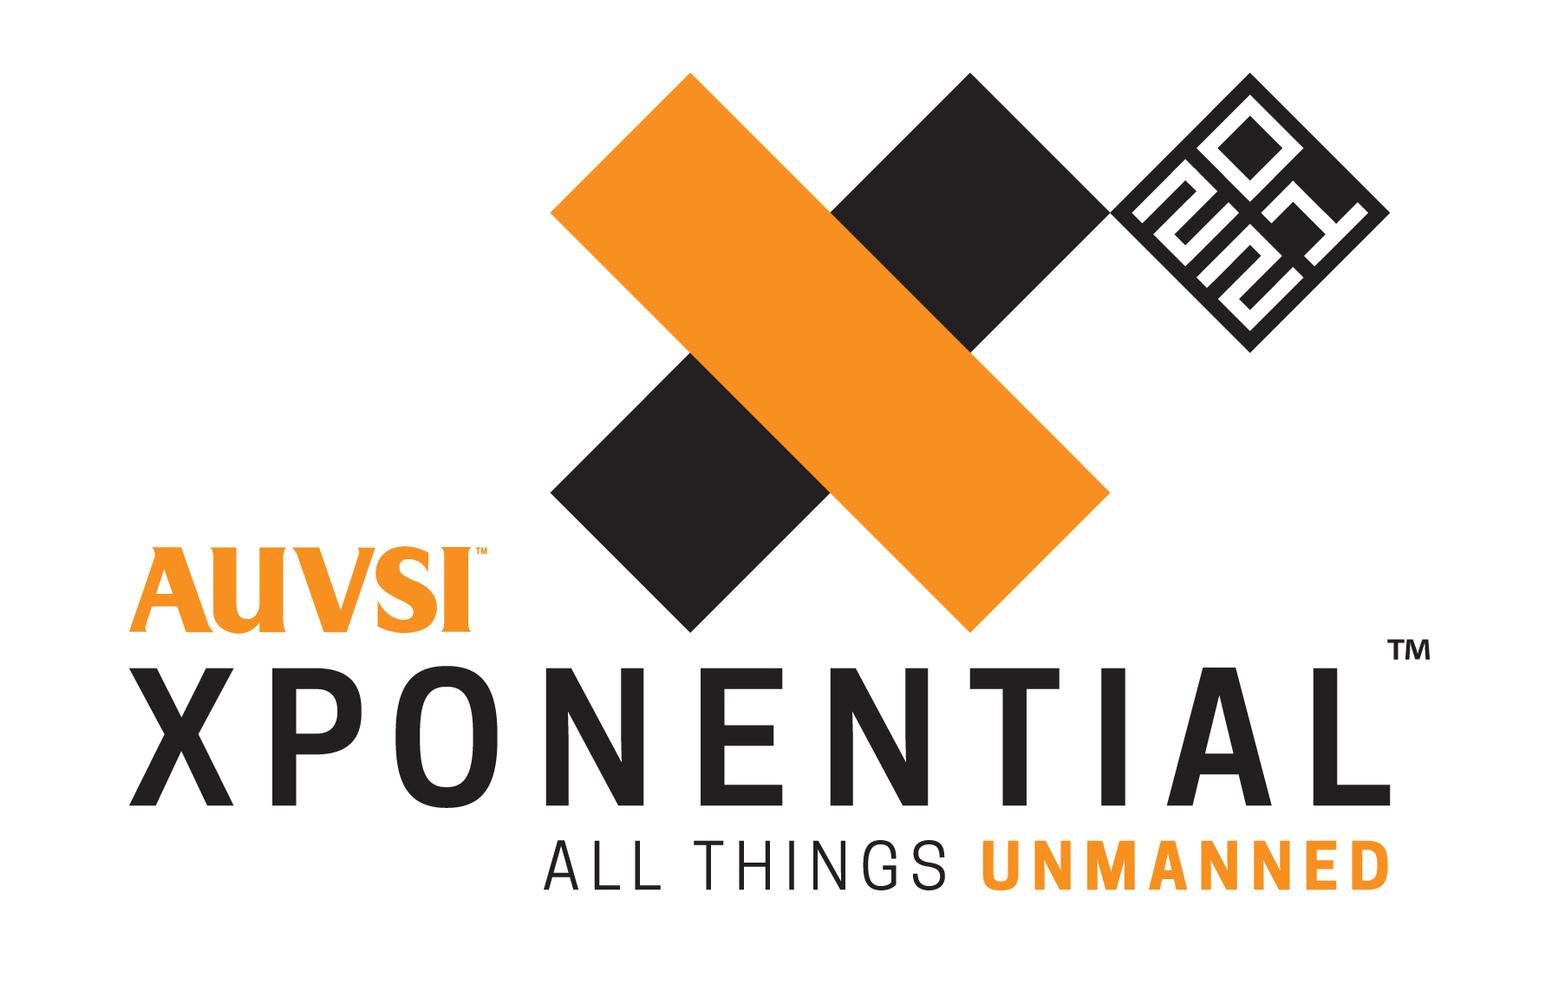 AUVSI Xponential 2021 logo